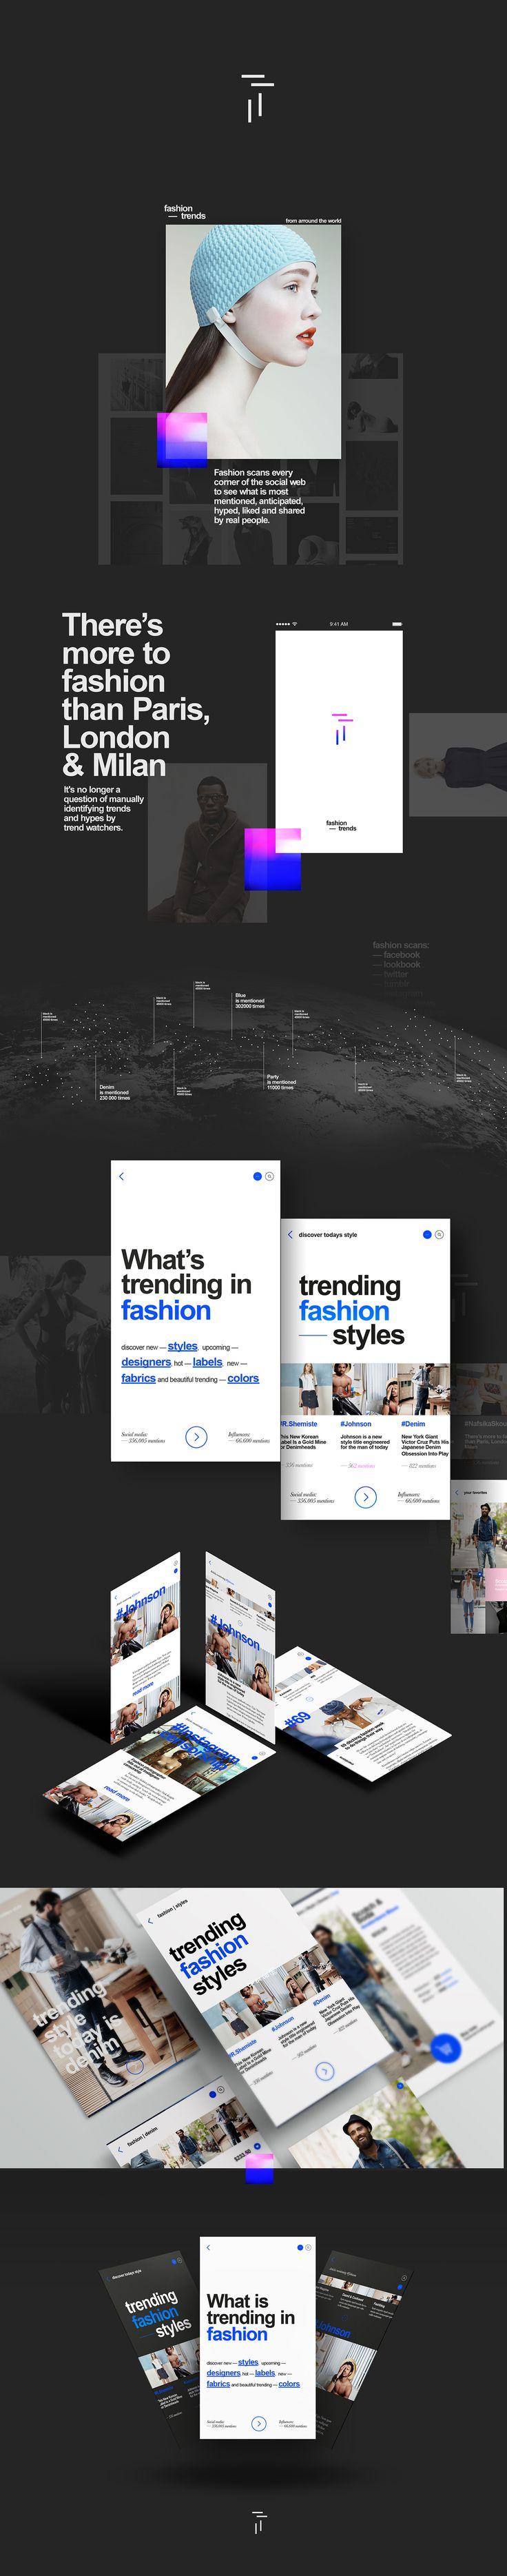 #fashion trends on App Design Served